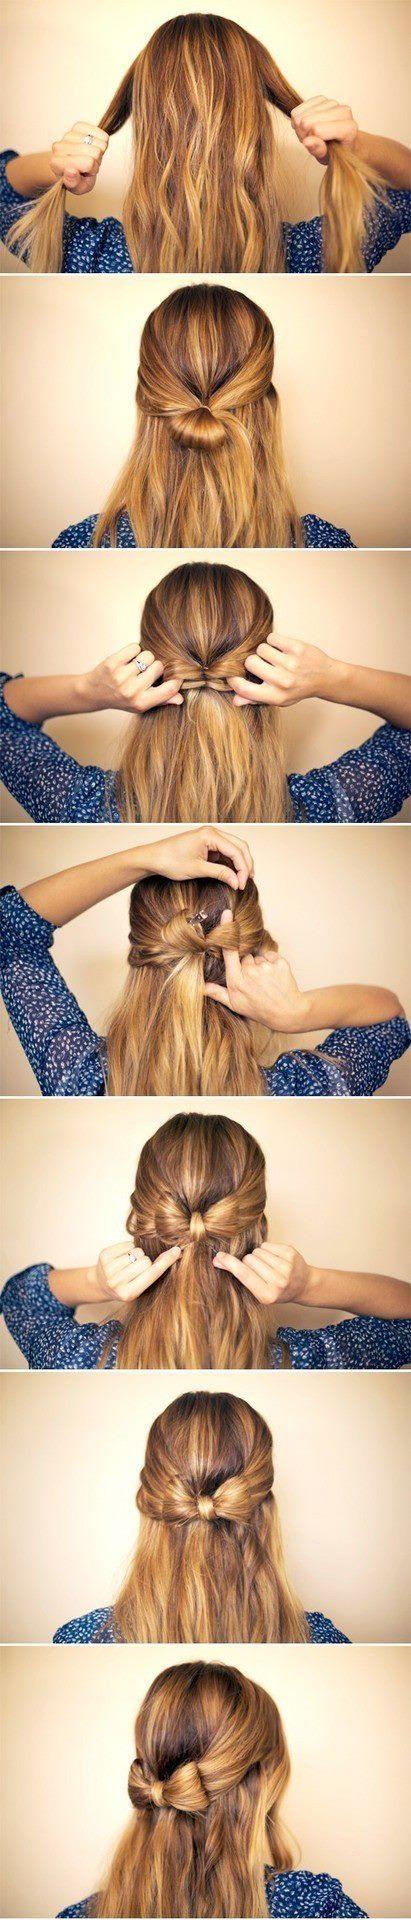 Alice in Wonderland hair...???: